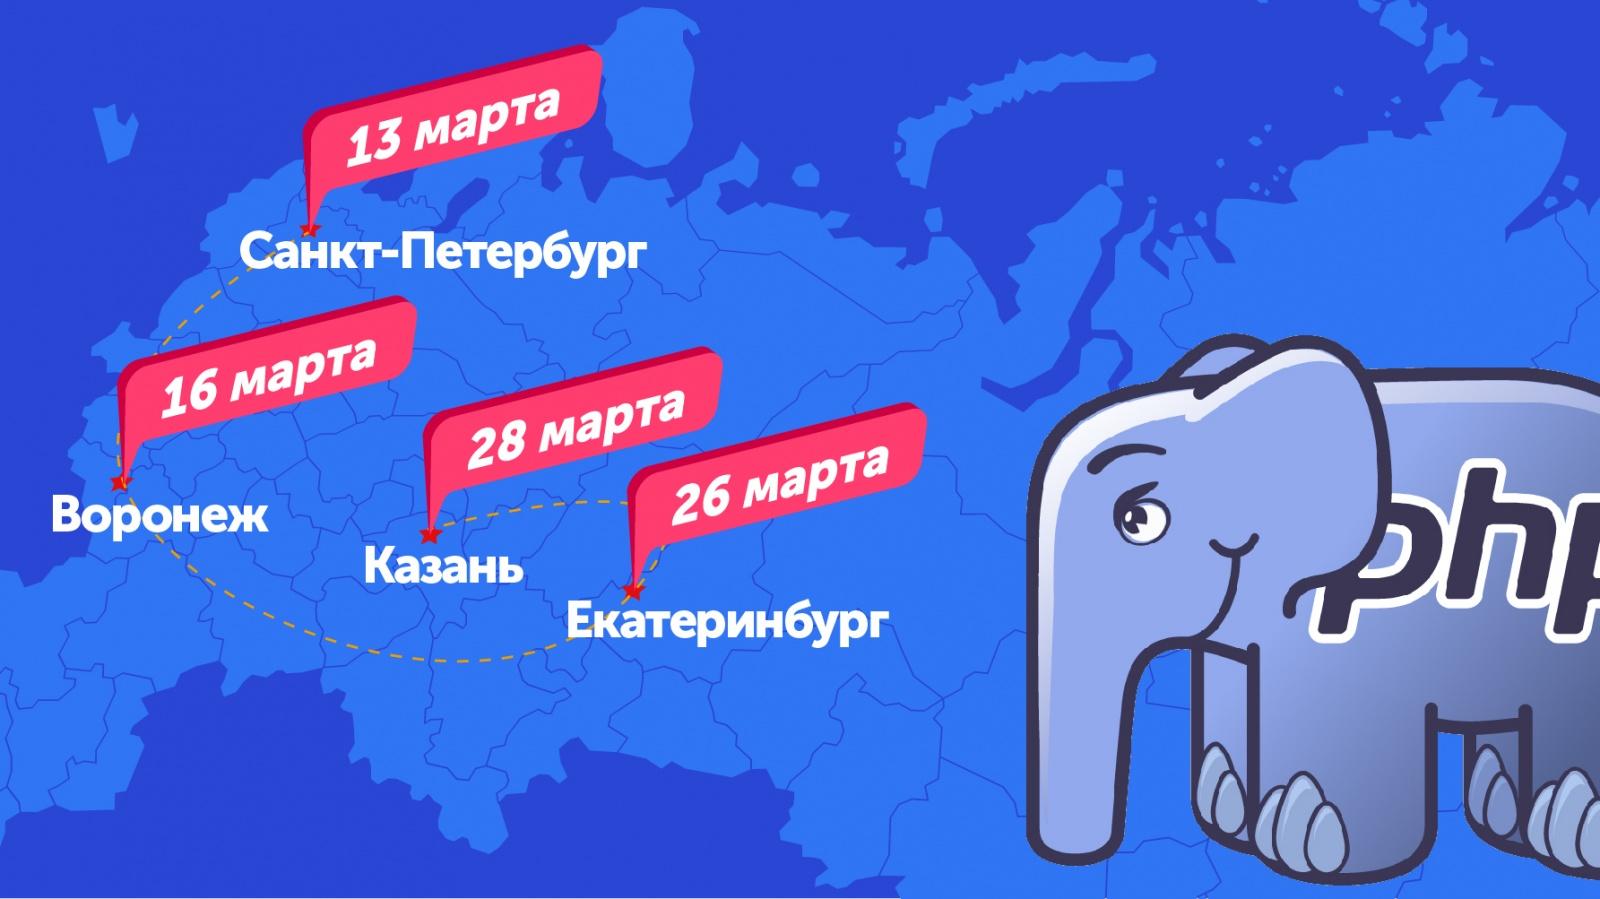 Митапы PHP-сообществ в марте: Питер, Воронеж, Екатеринбург, Казань - 1